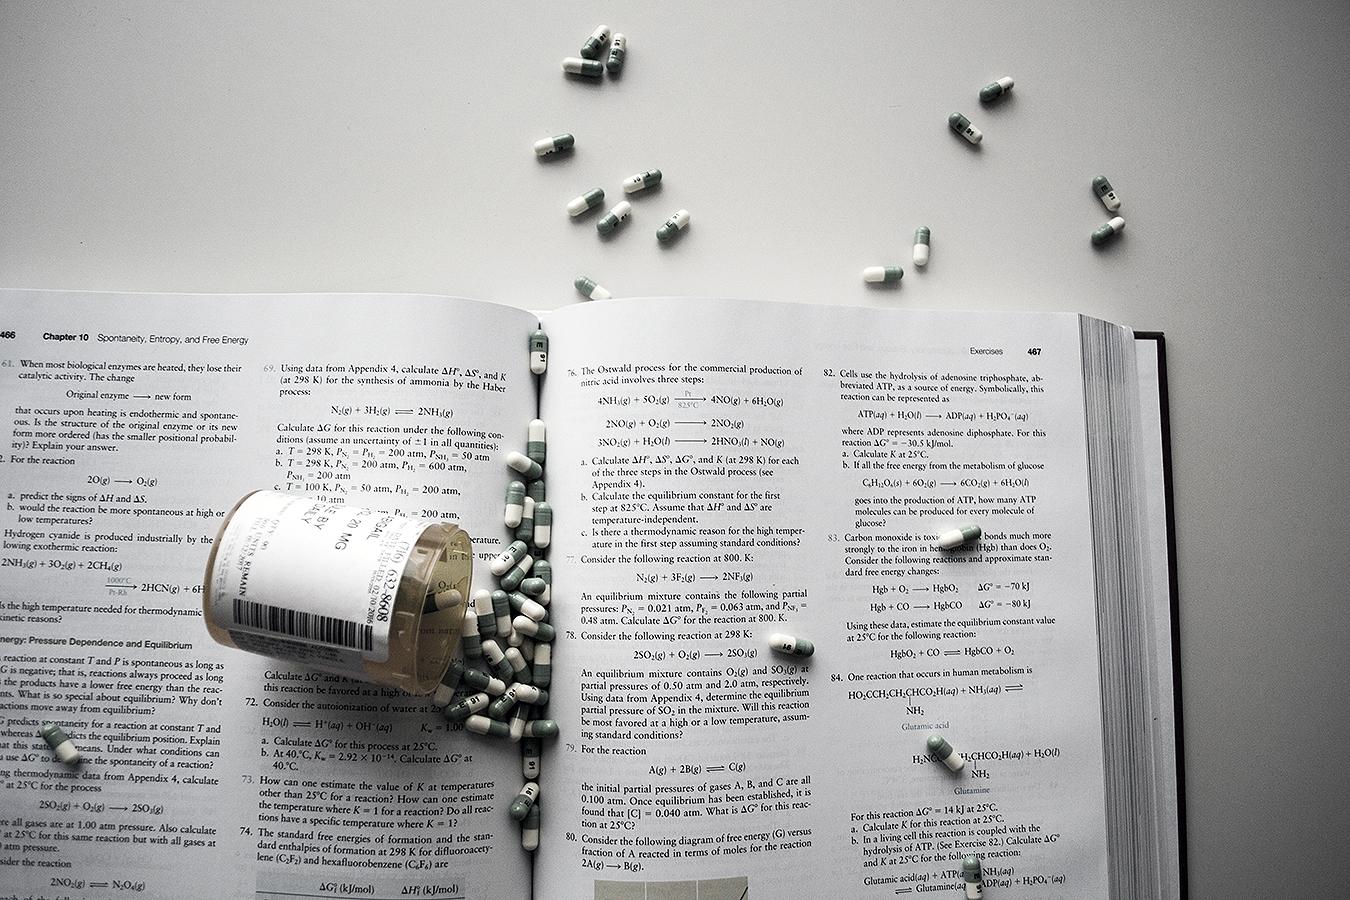 Alexis_Masino_photography_drugs_coffee_habits_addiction_UPenn_student_addictions_prozac